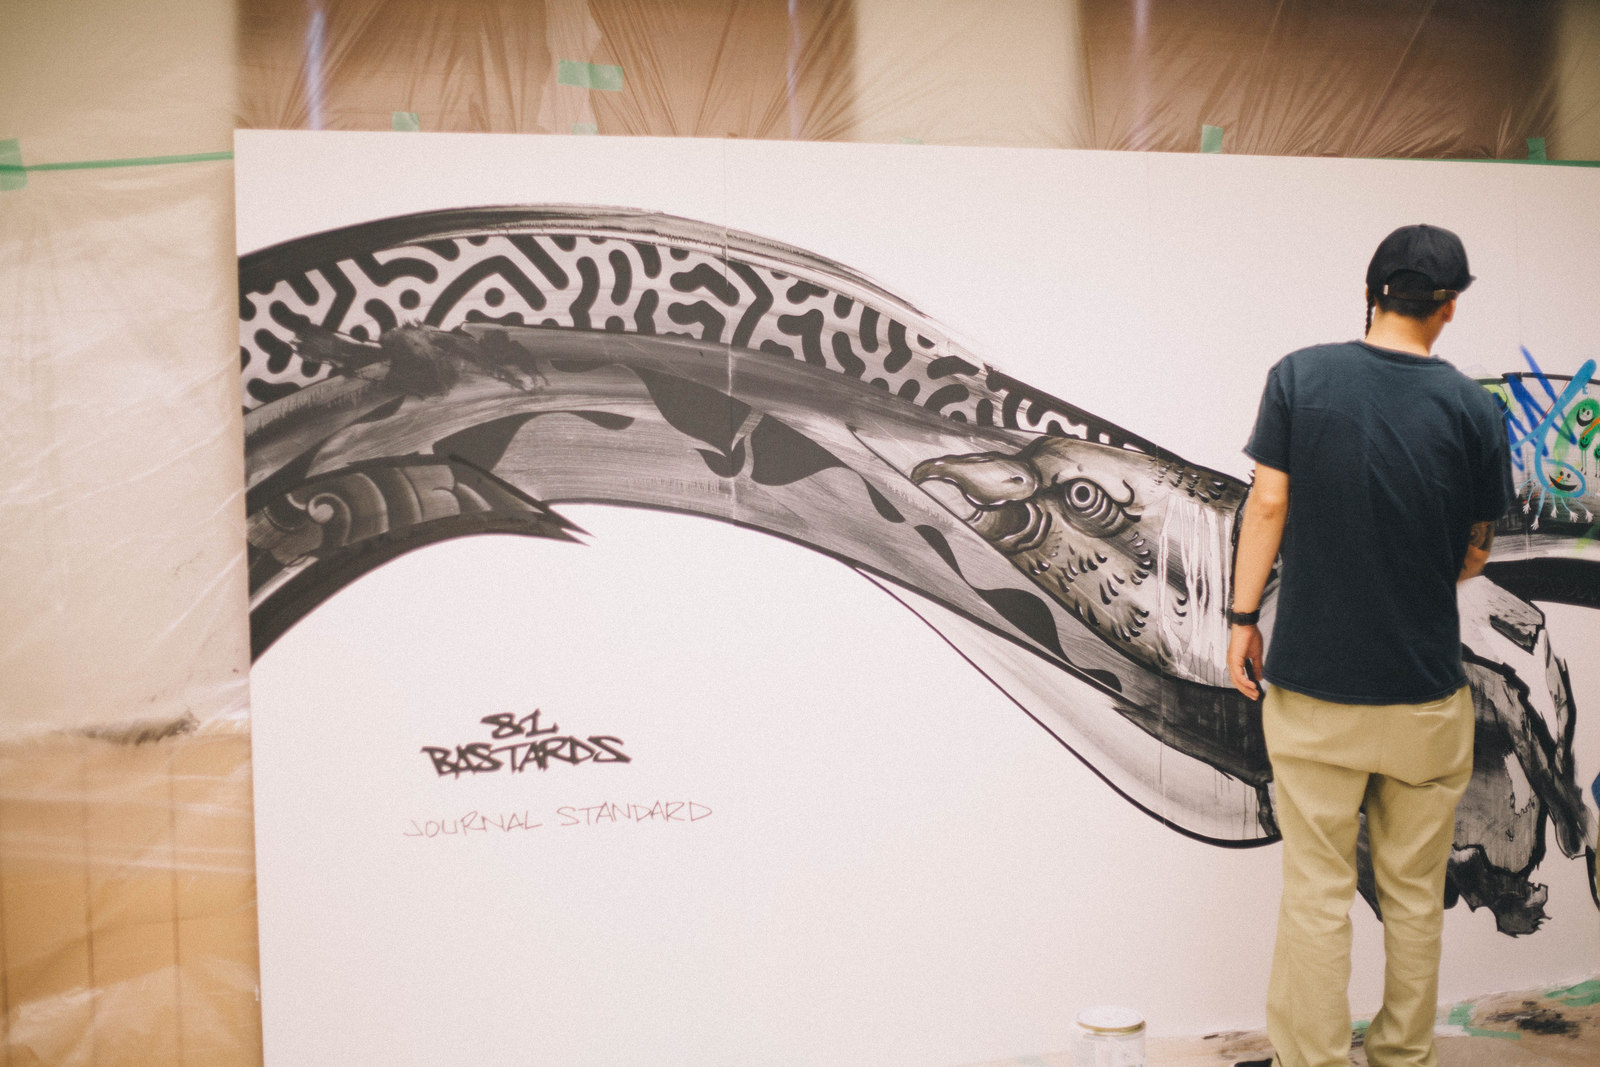 IMG_1371 国内外で活躍するアーティスト4組の「作品の向こう側」| ジャーナル スタンダード「オムニバス展」密着レポート!